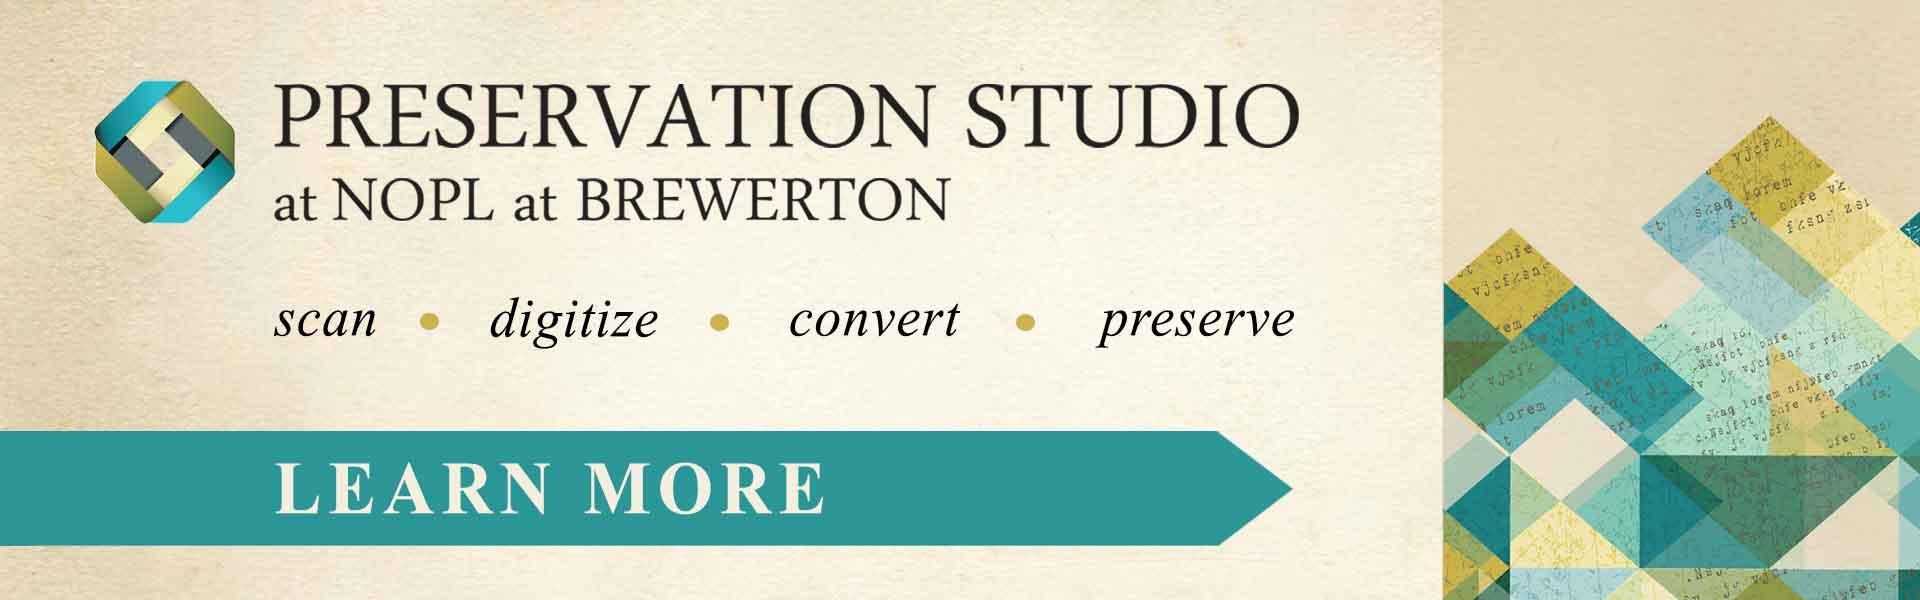 Preservation Studio NOPL Brewerton